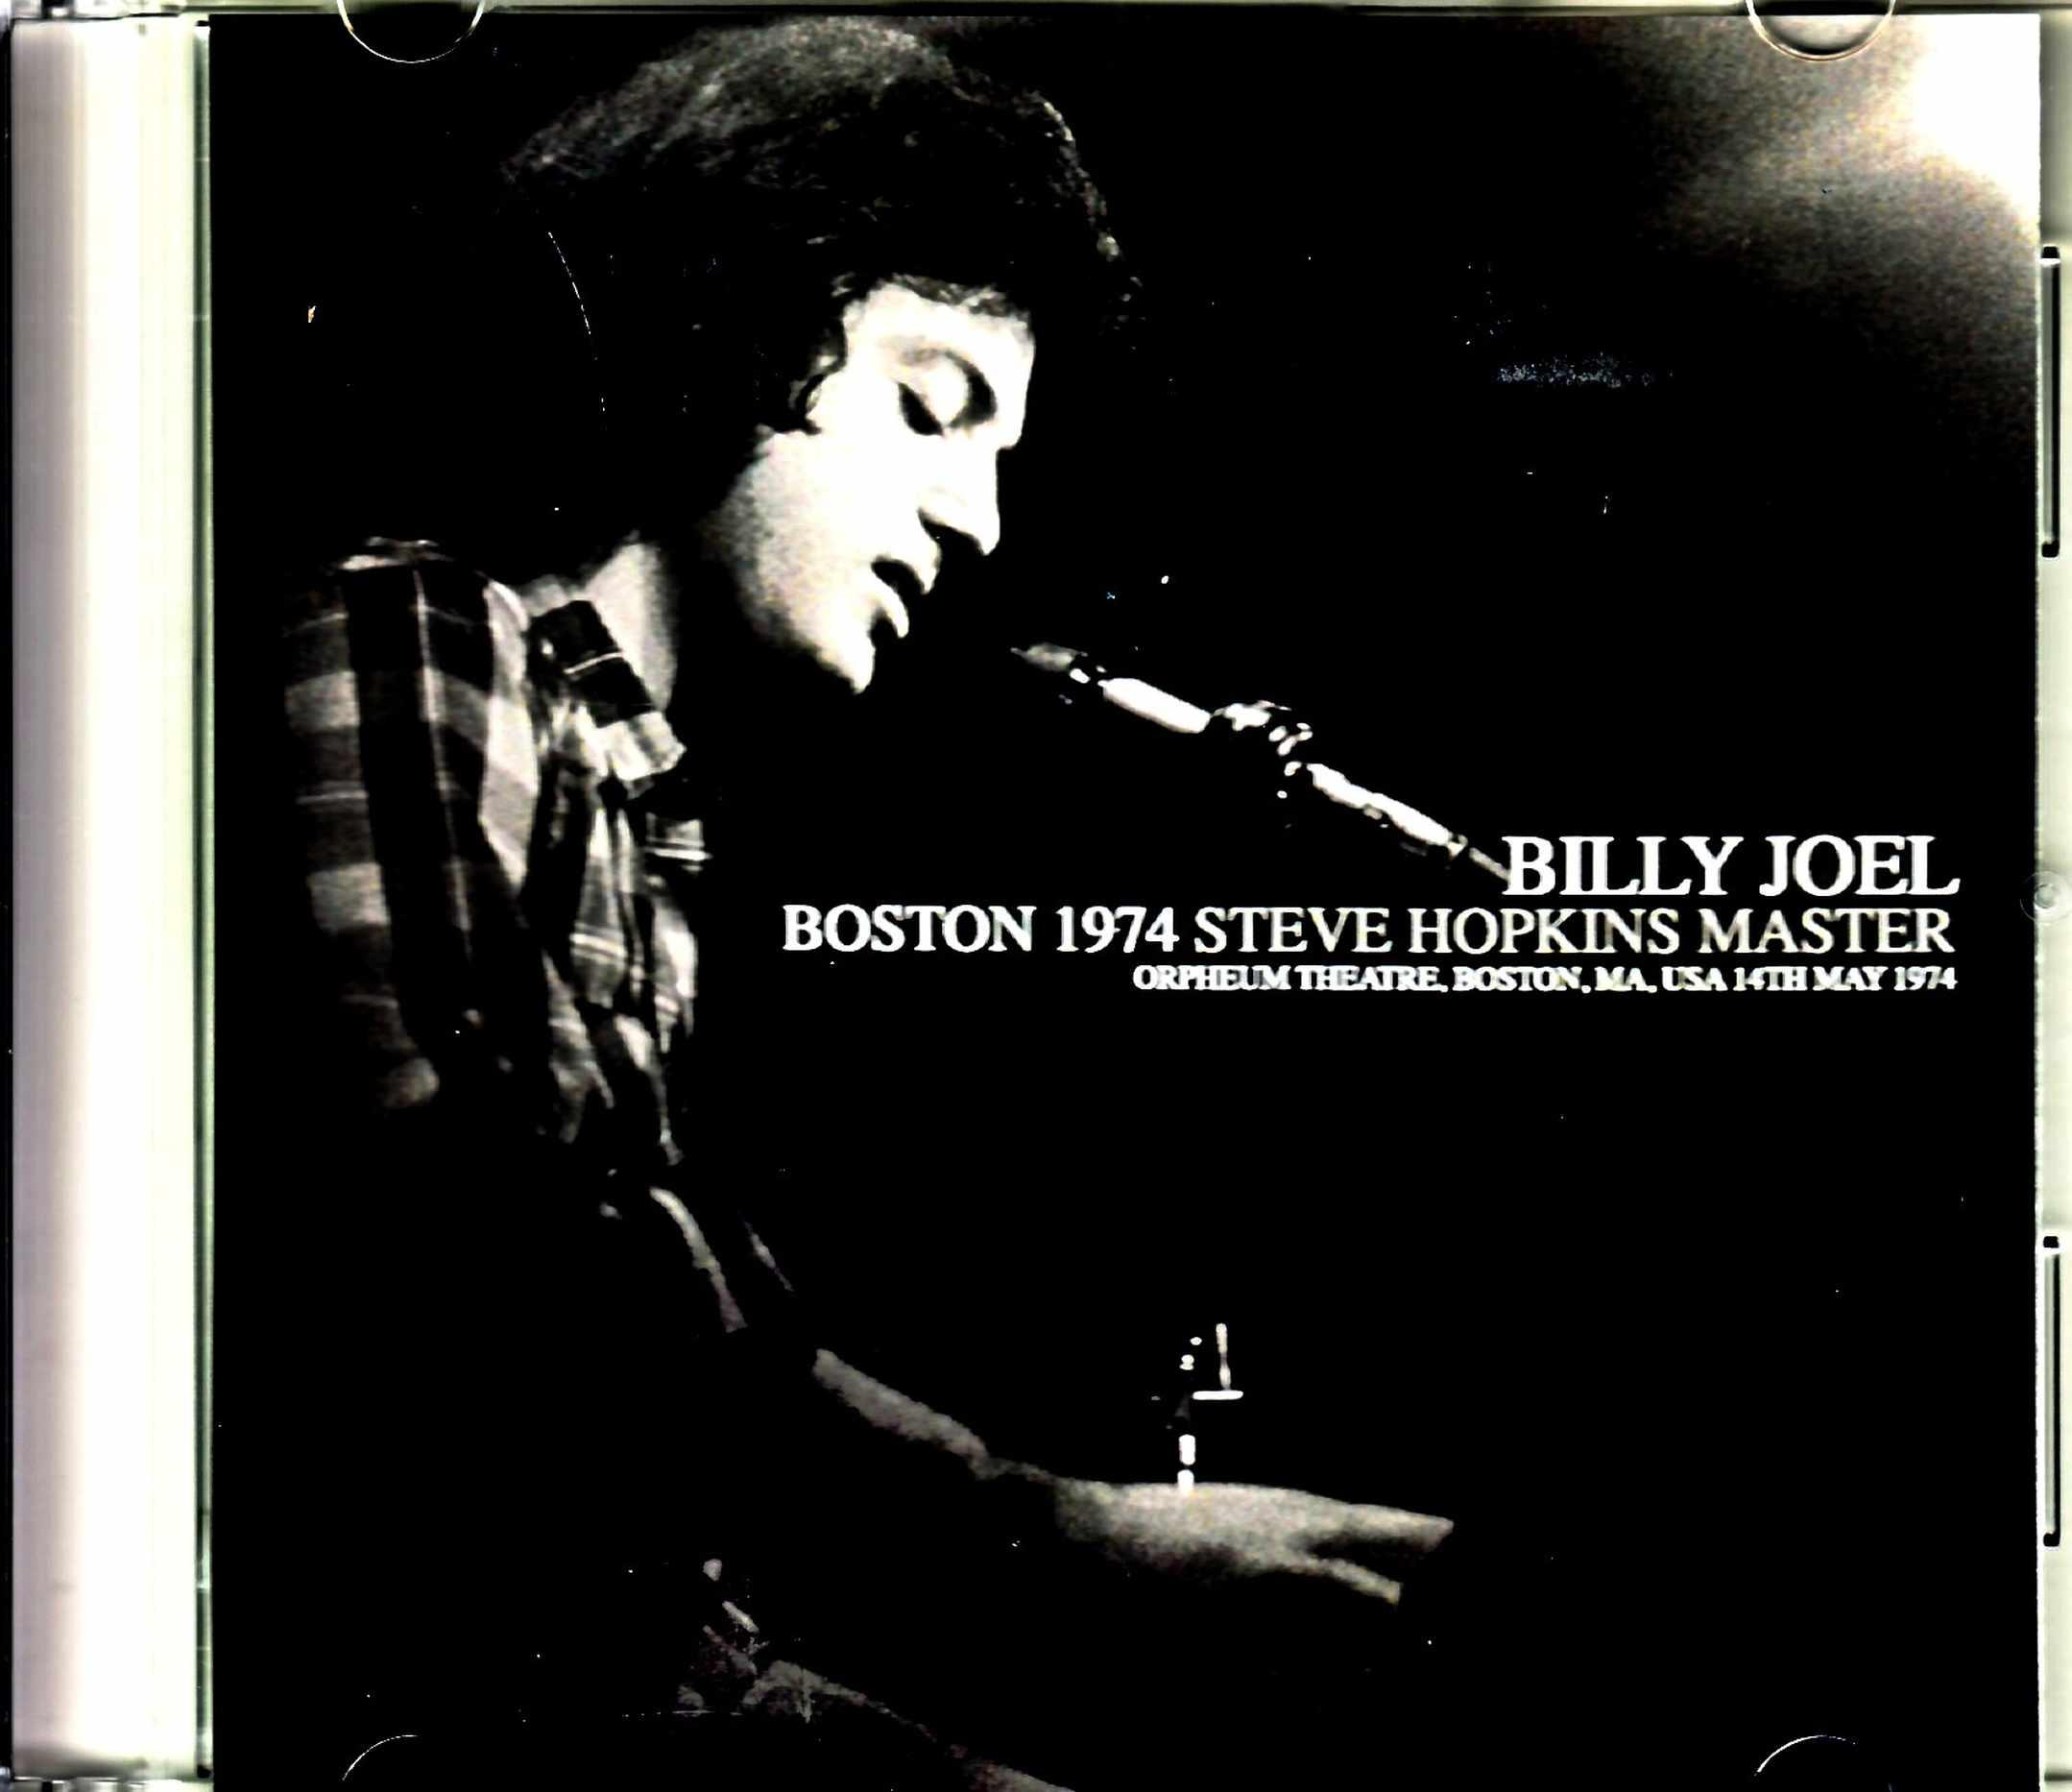 Billy Joel ビリー・ジョエル/MA,USA 1974